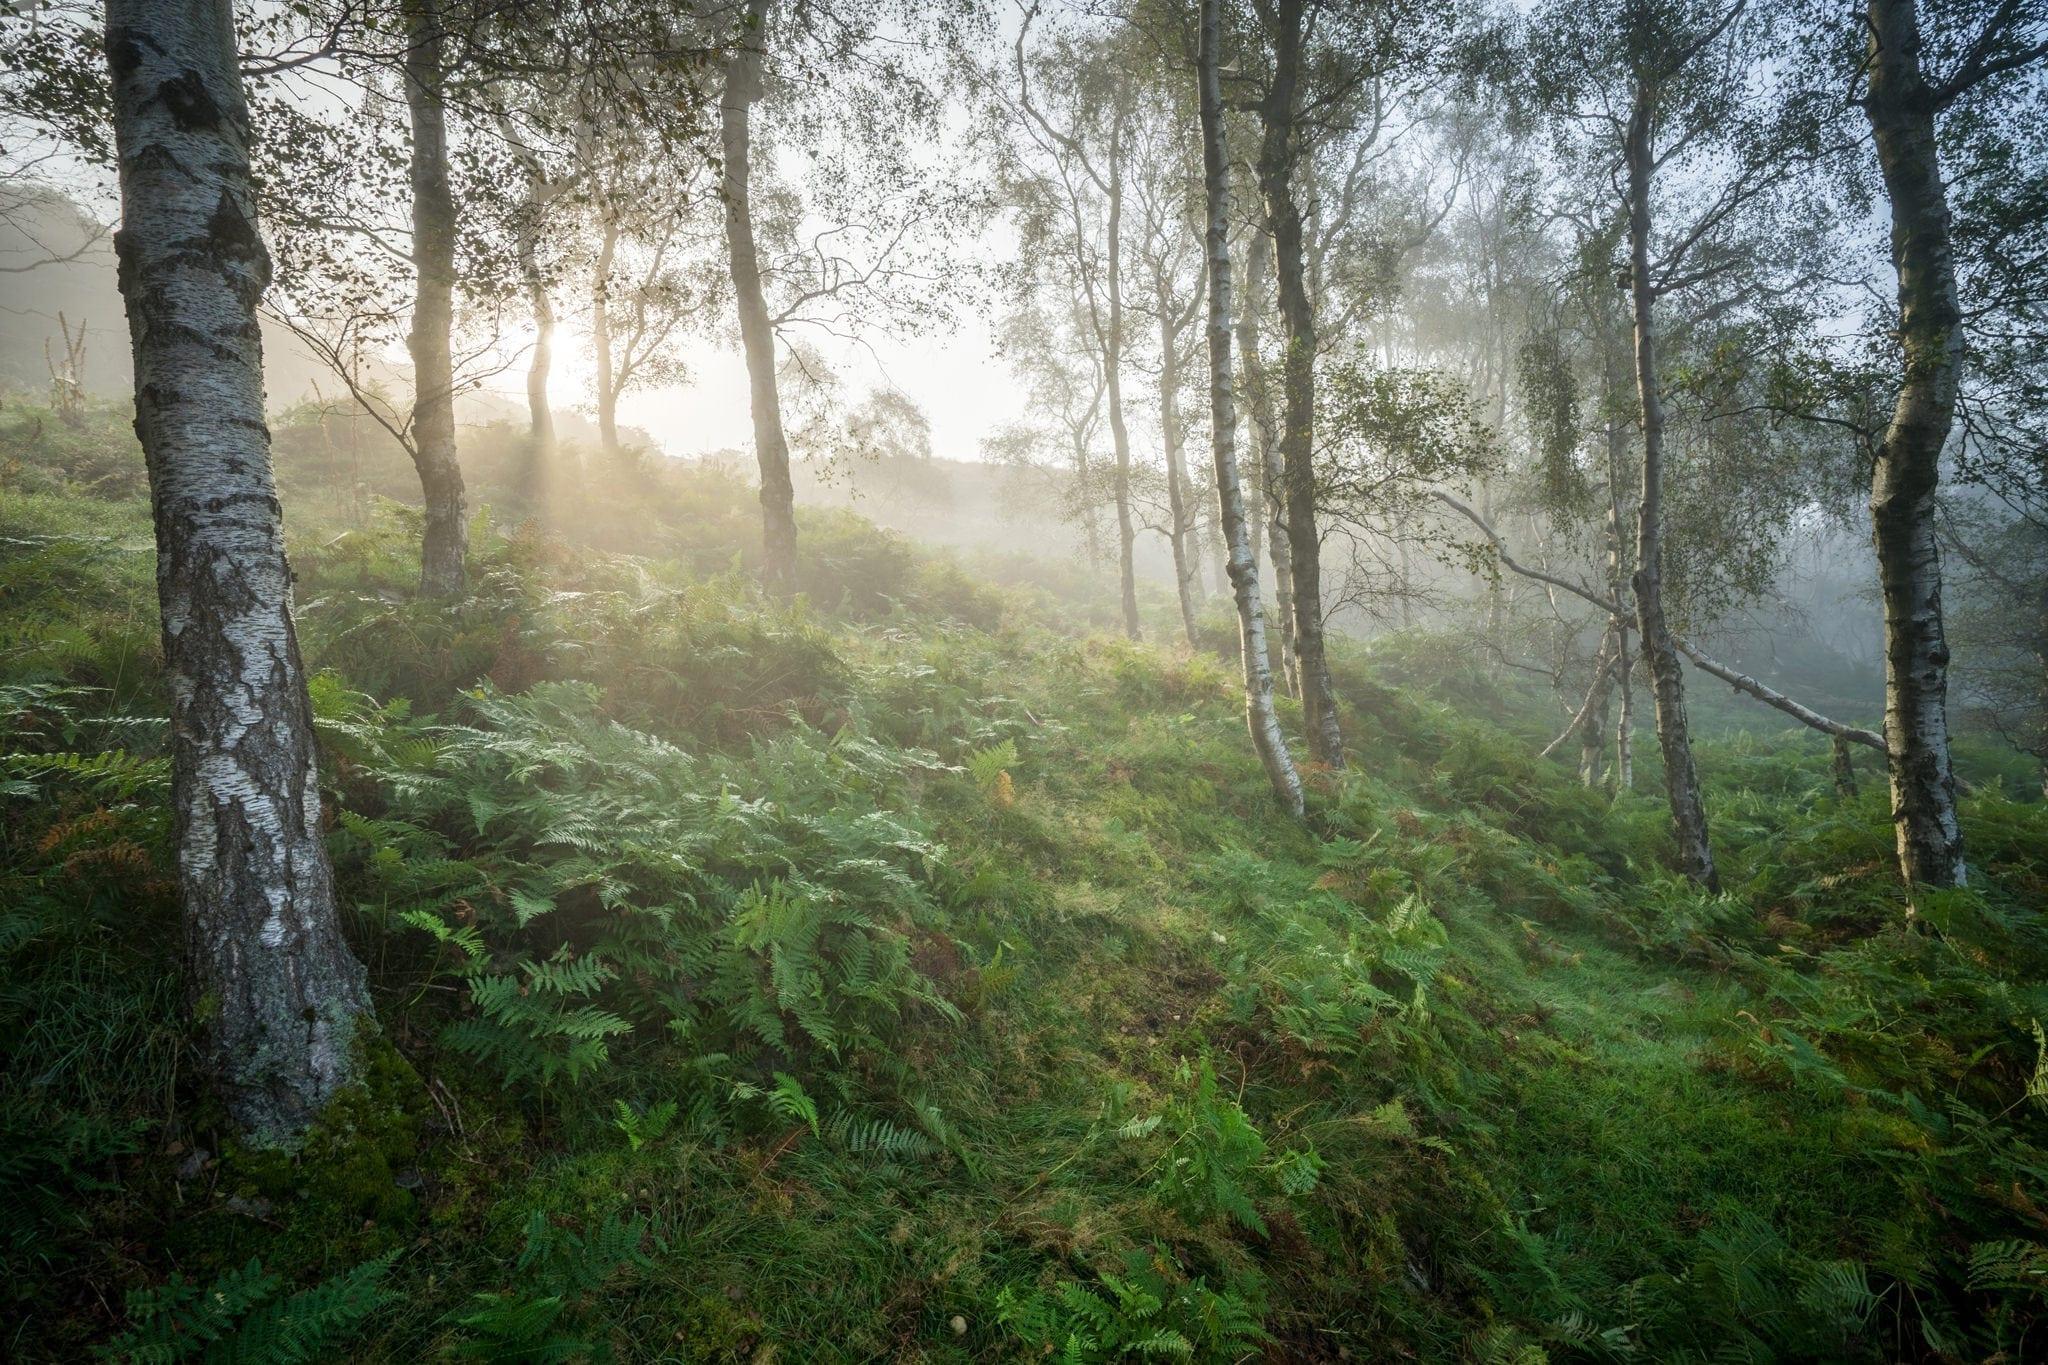 Bolehill Fog - Gritstone Edges Peak District Photography Workshop